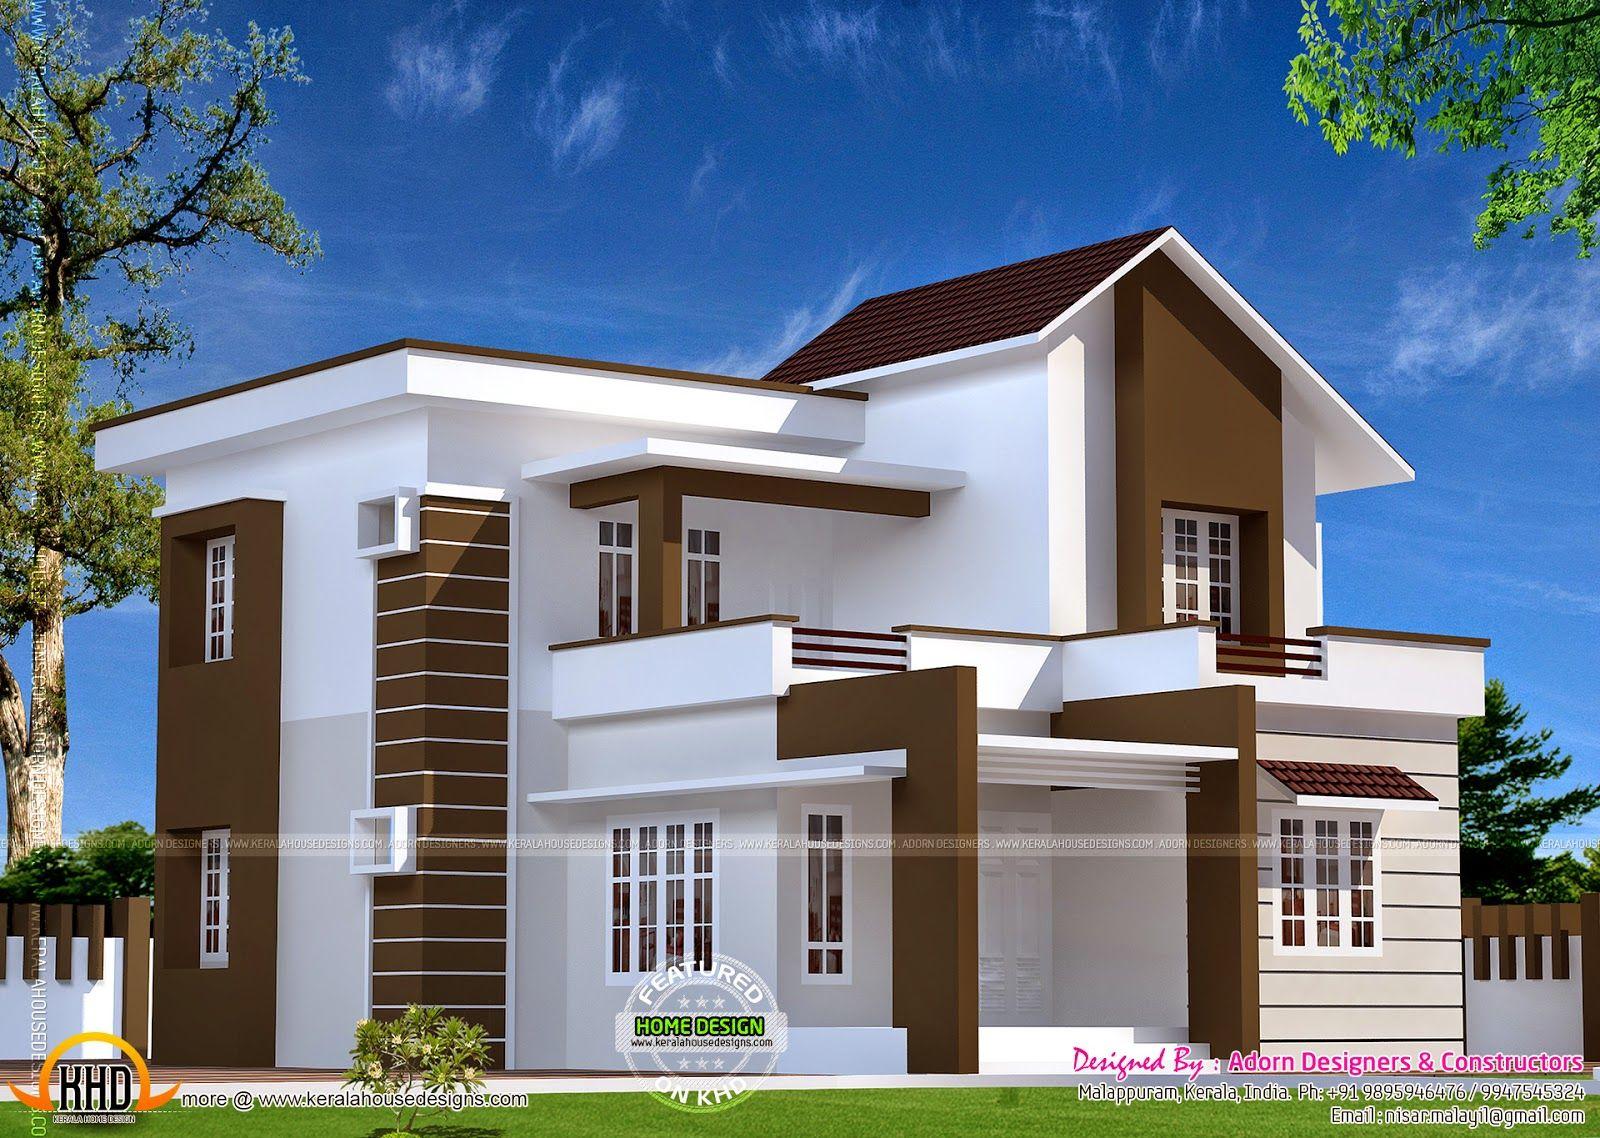 Double Storied Home Kerala Kerala Home Design Floor Plans